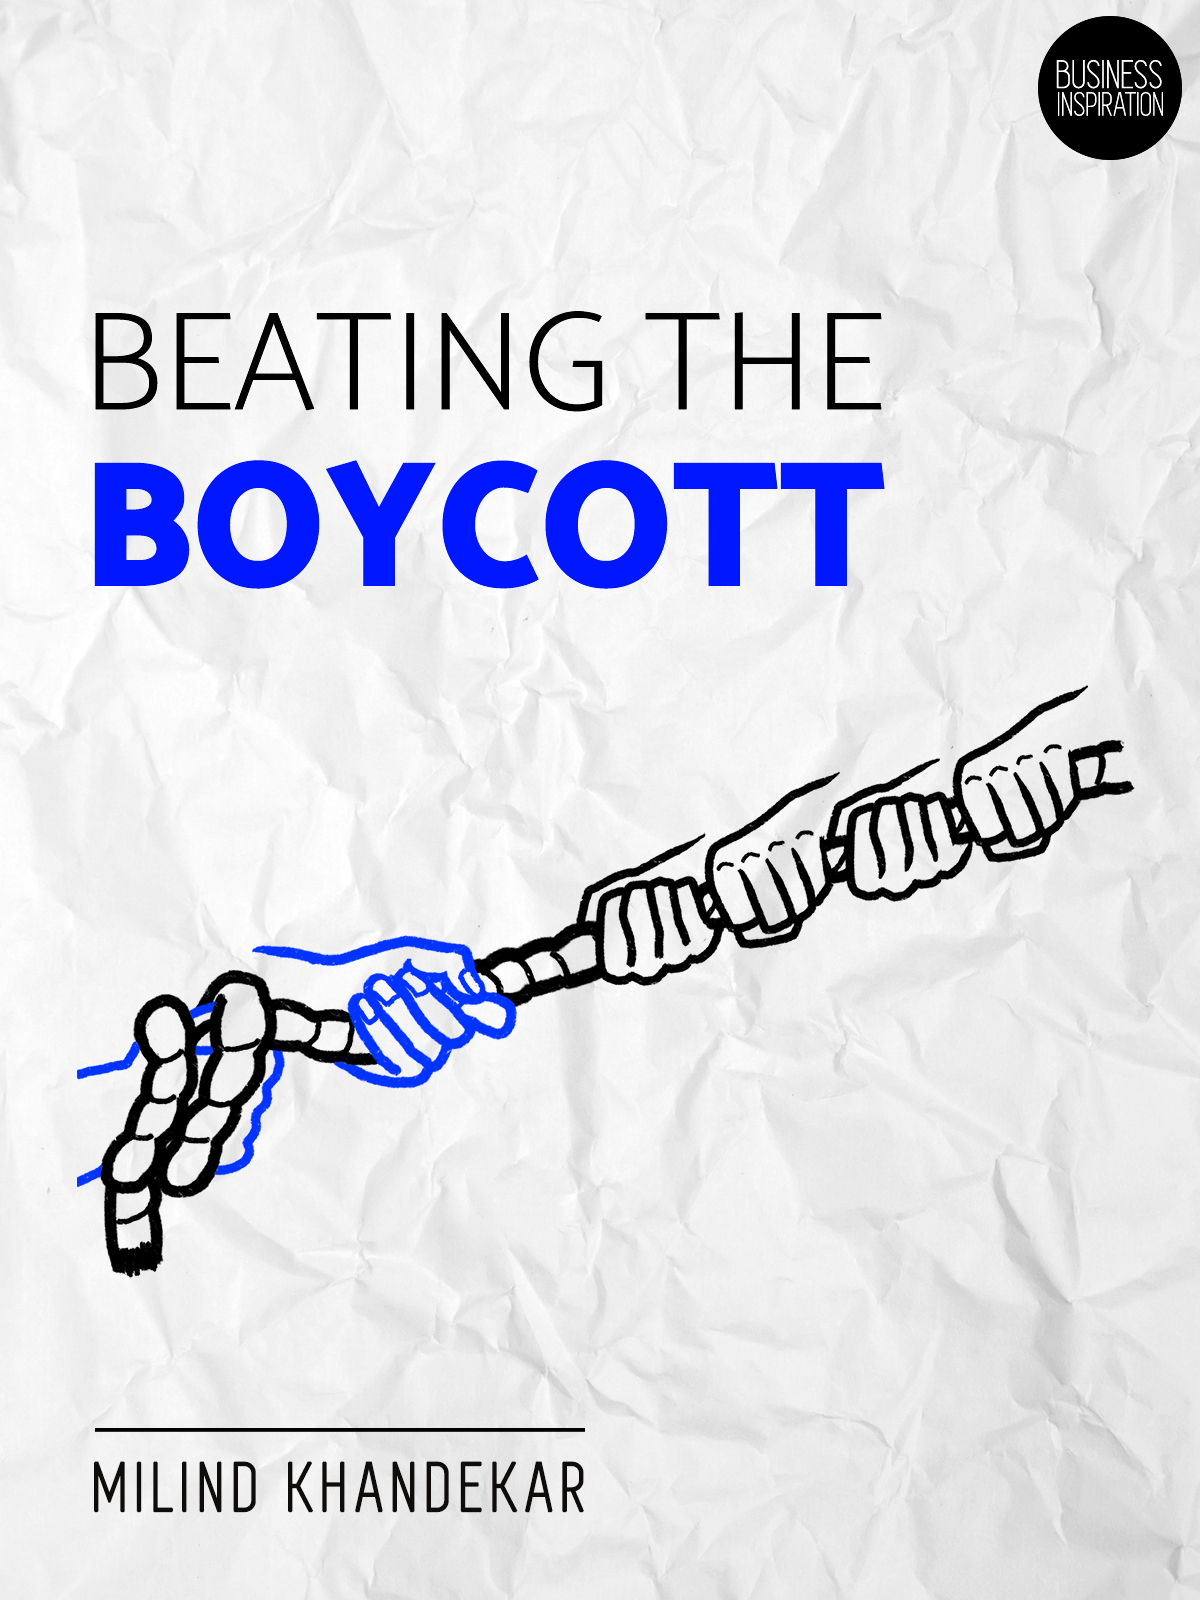 Beating the Boycott